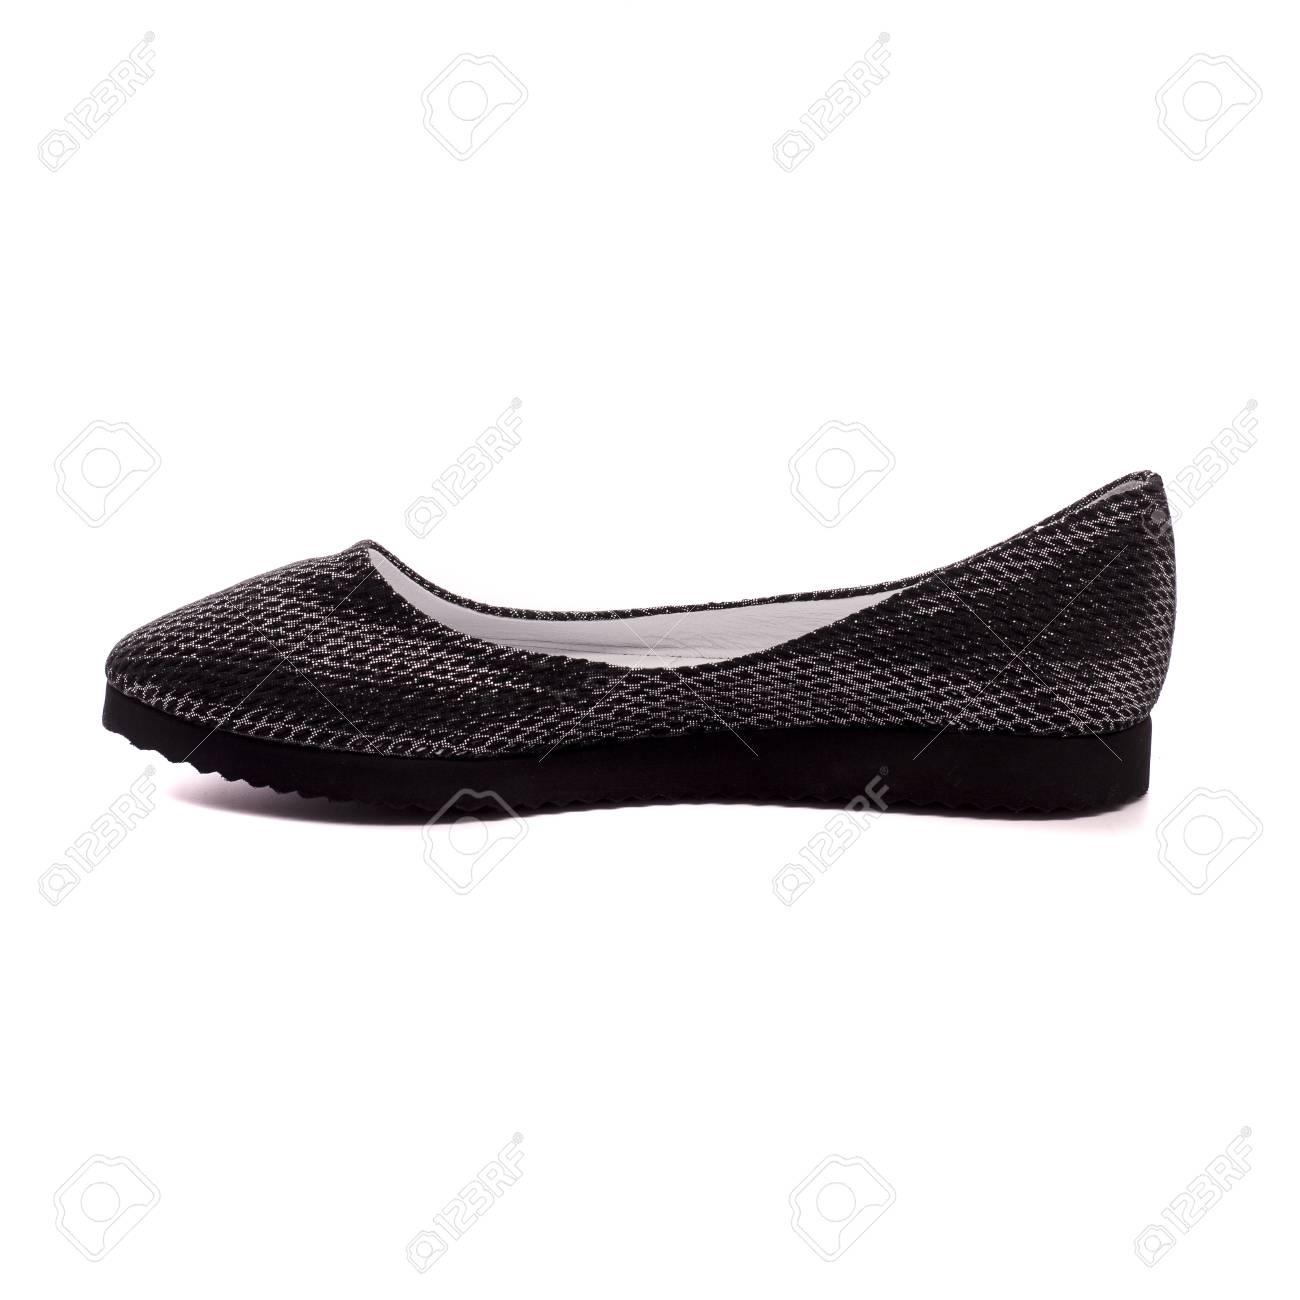 f7840e08c black women's shoes isolated on white background Stock Photo - 91085975